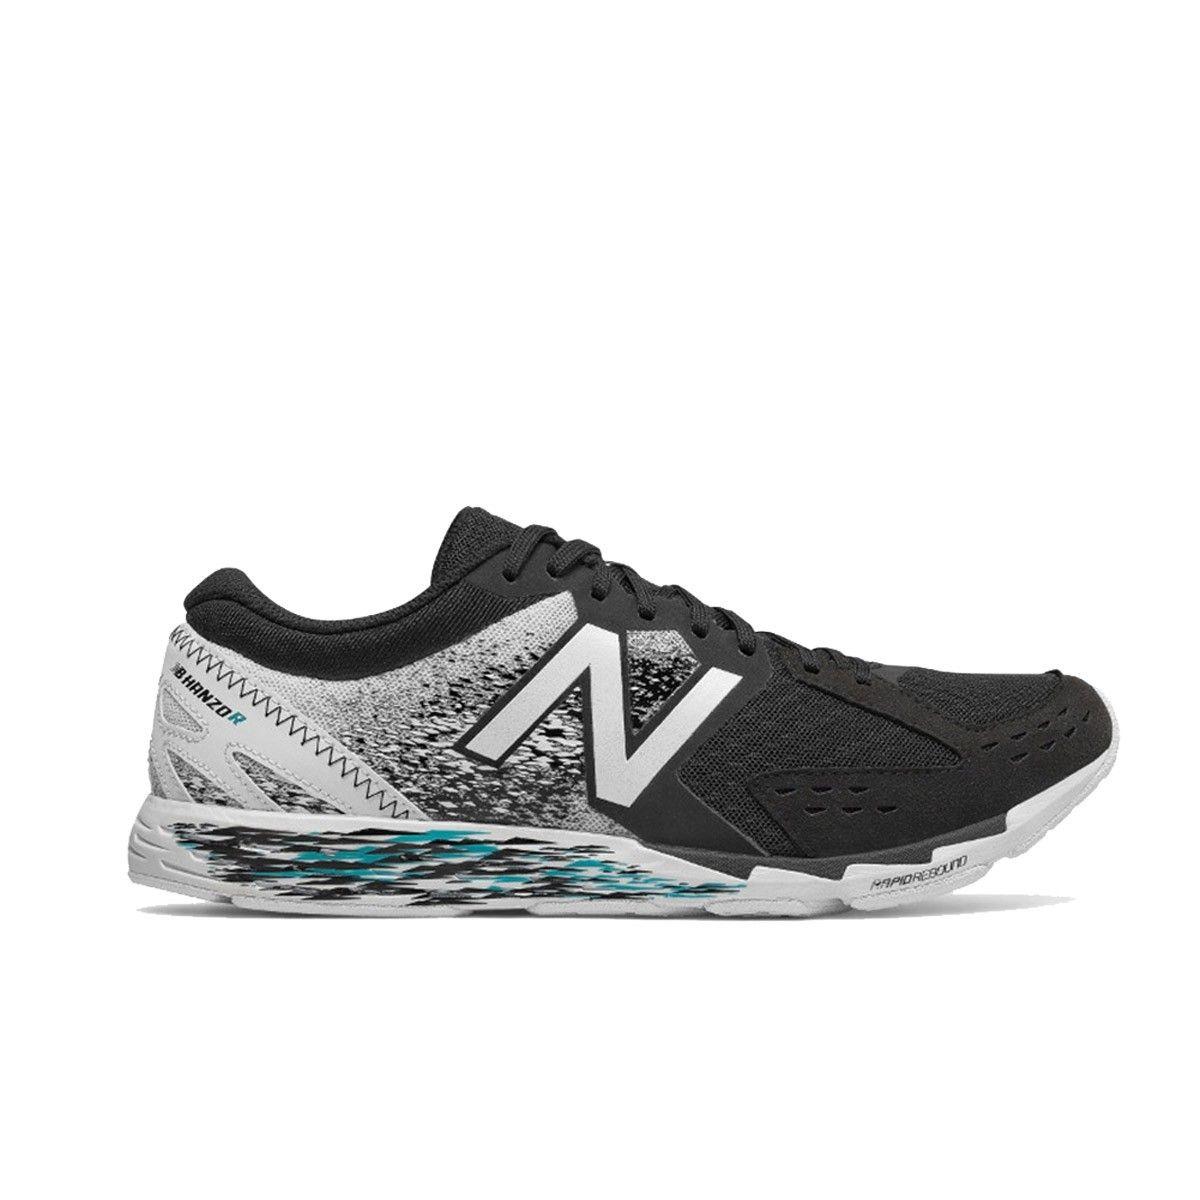 4f7ad771adbd Hanzo Race Men s Running Shoes - Lari - Sepatu - Pria - Planetsports ...